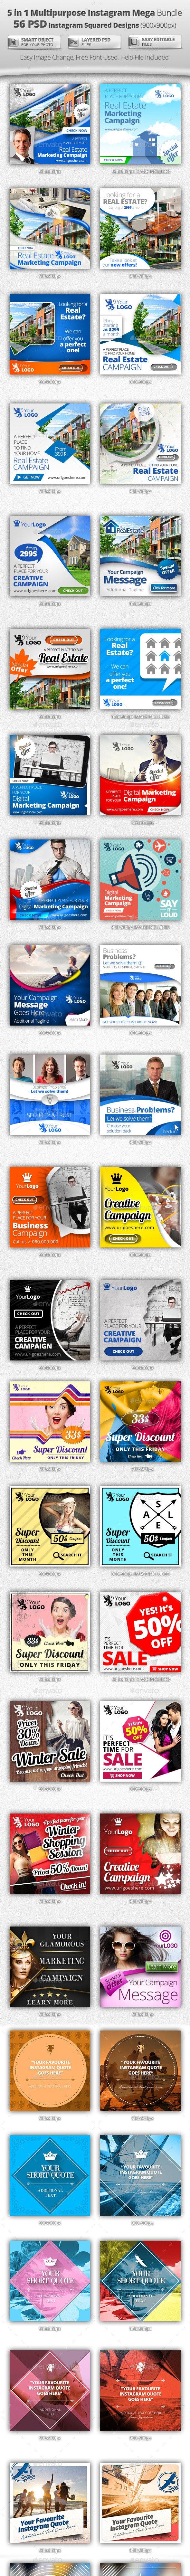 56 Instagram Design Templates - 5 in 1 Bundle - Banners & Ads Web Elements